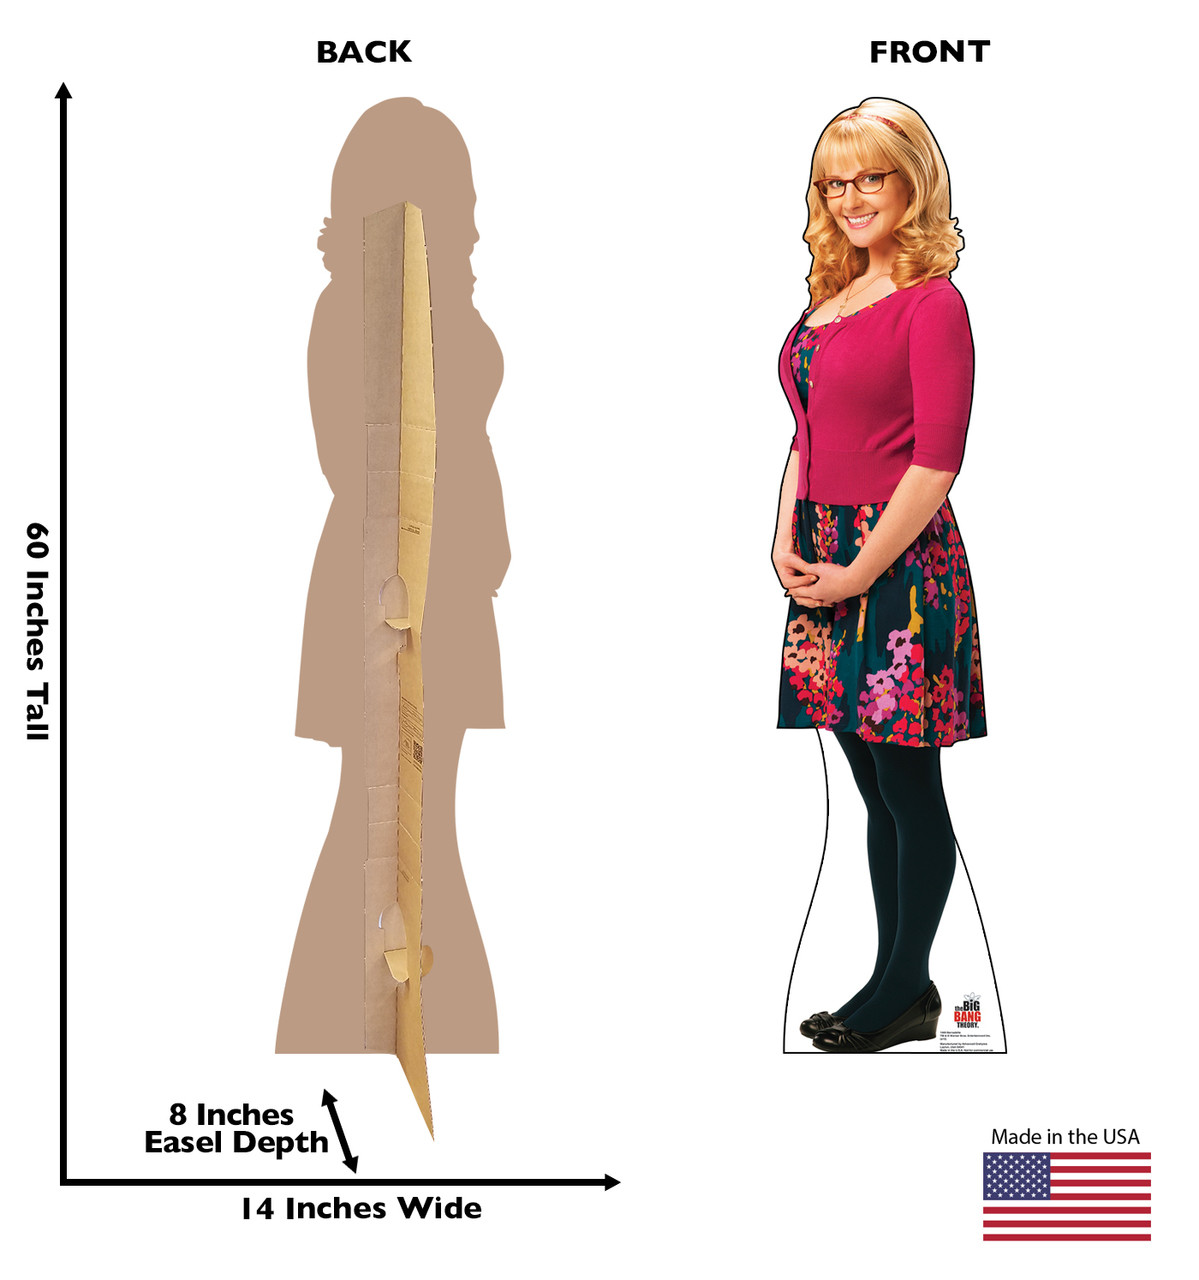 Life-size Bernadette - Big Bang Theory Cardboard Standup | Cardboard Cutout